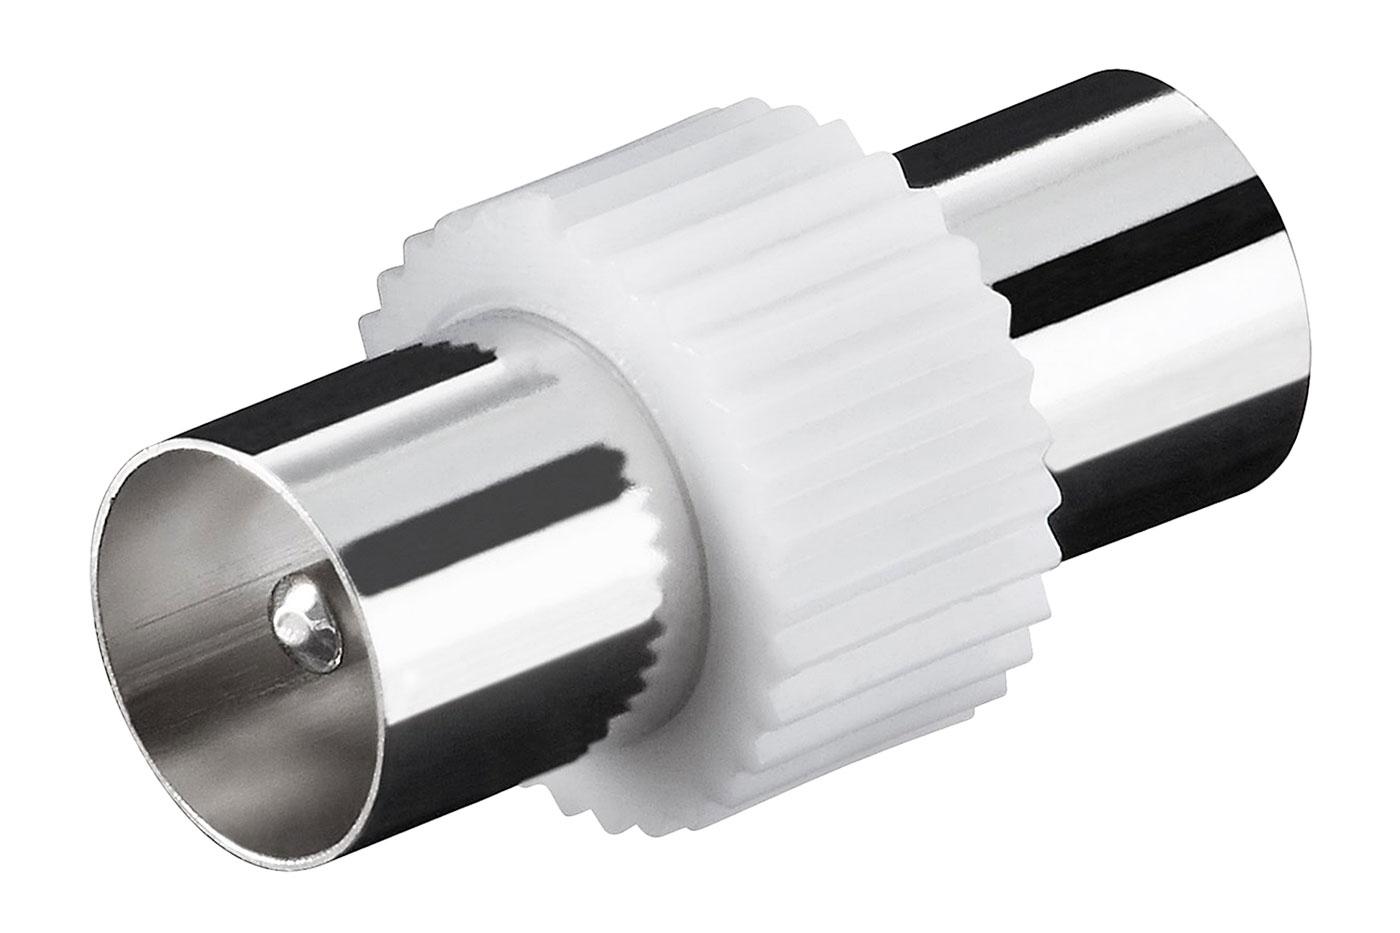 Adapter Koaxial-Stecker auf Koaxial-Stecker